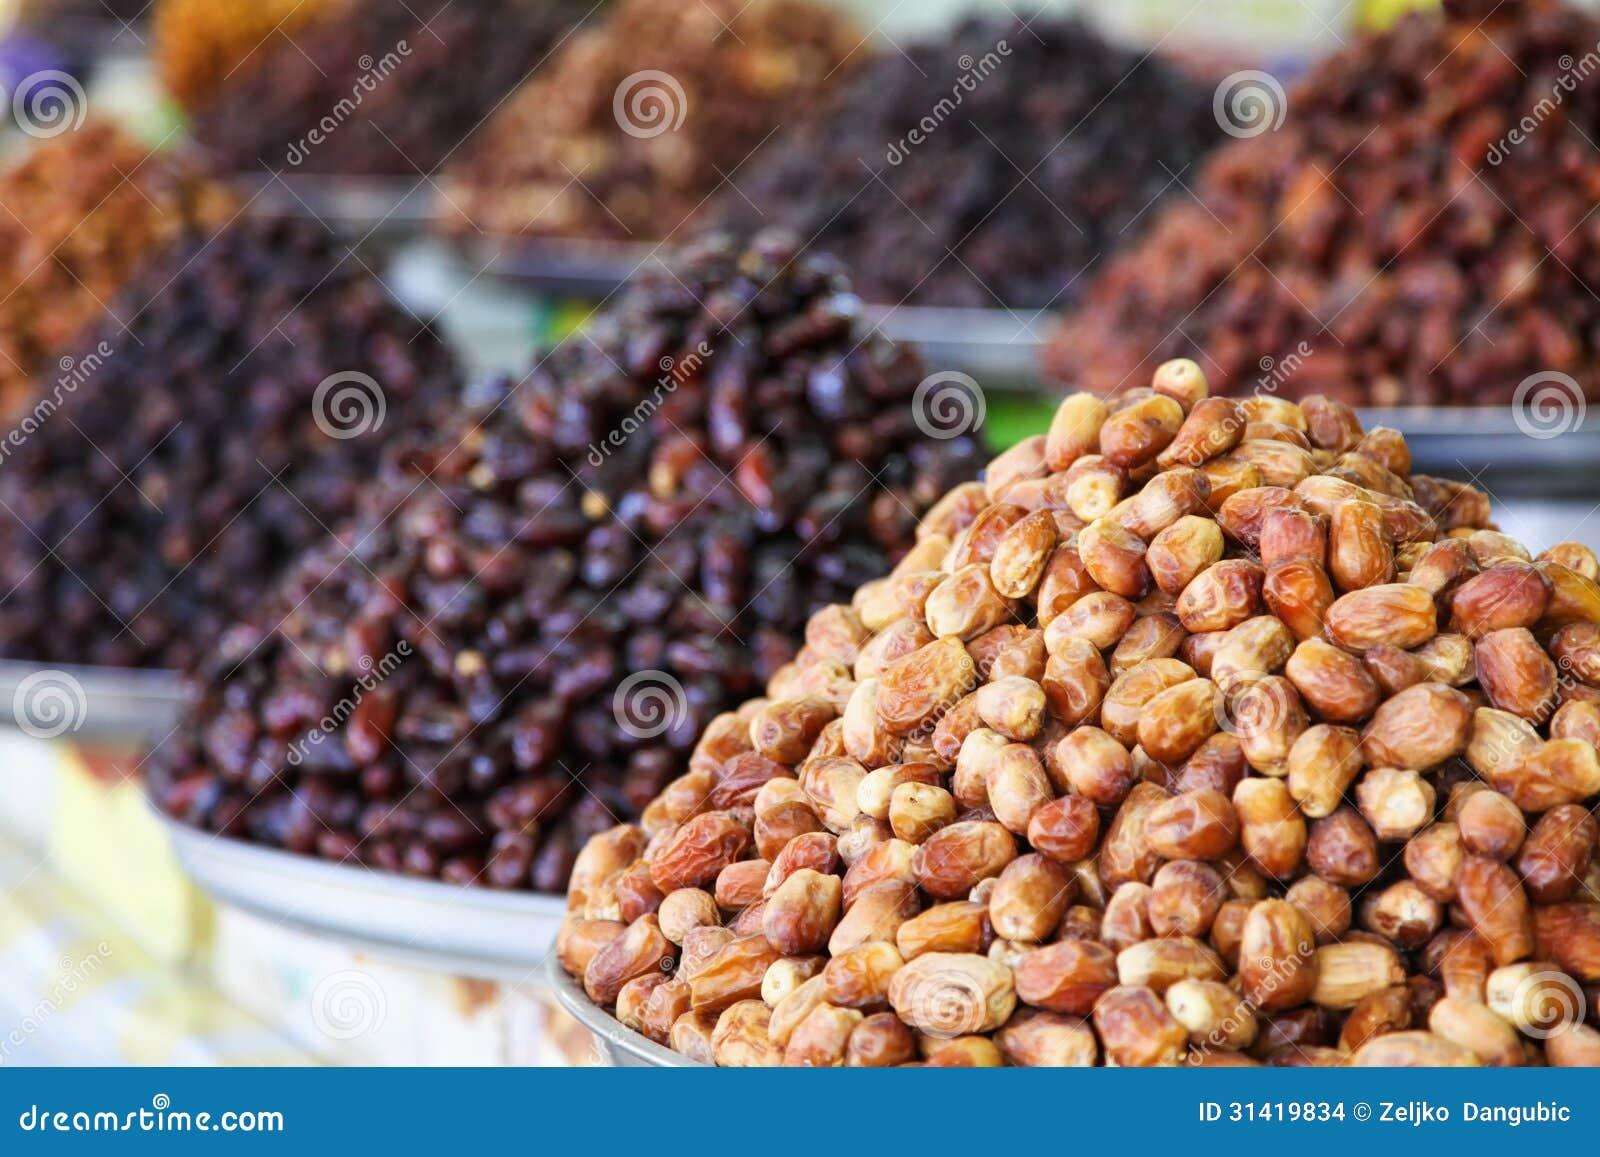 Organic Food Dubai